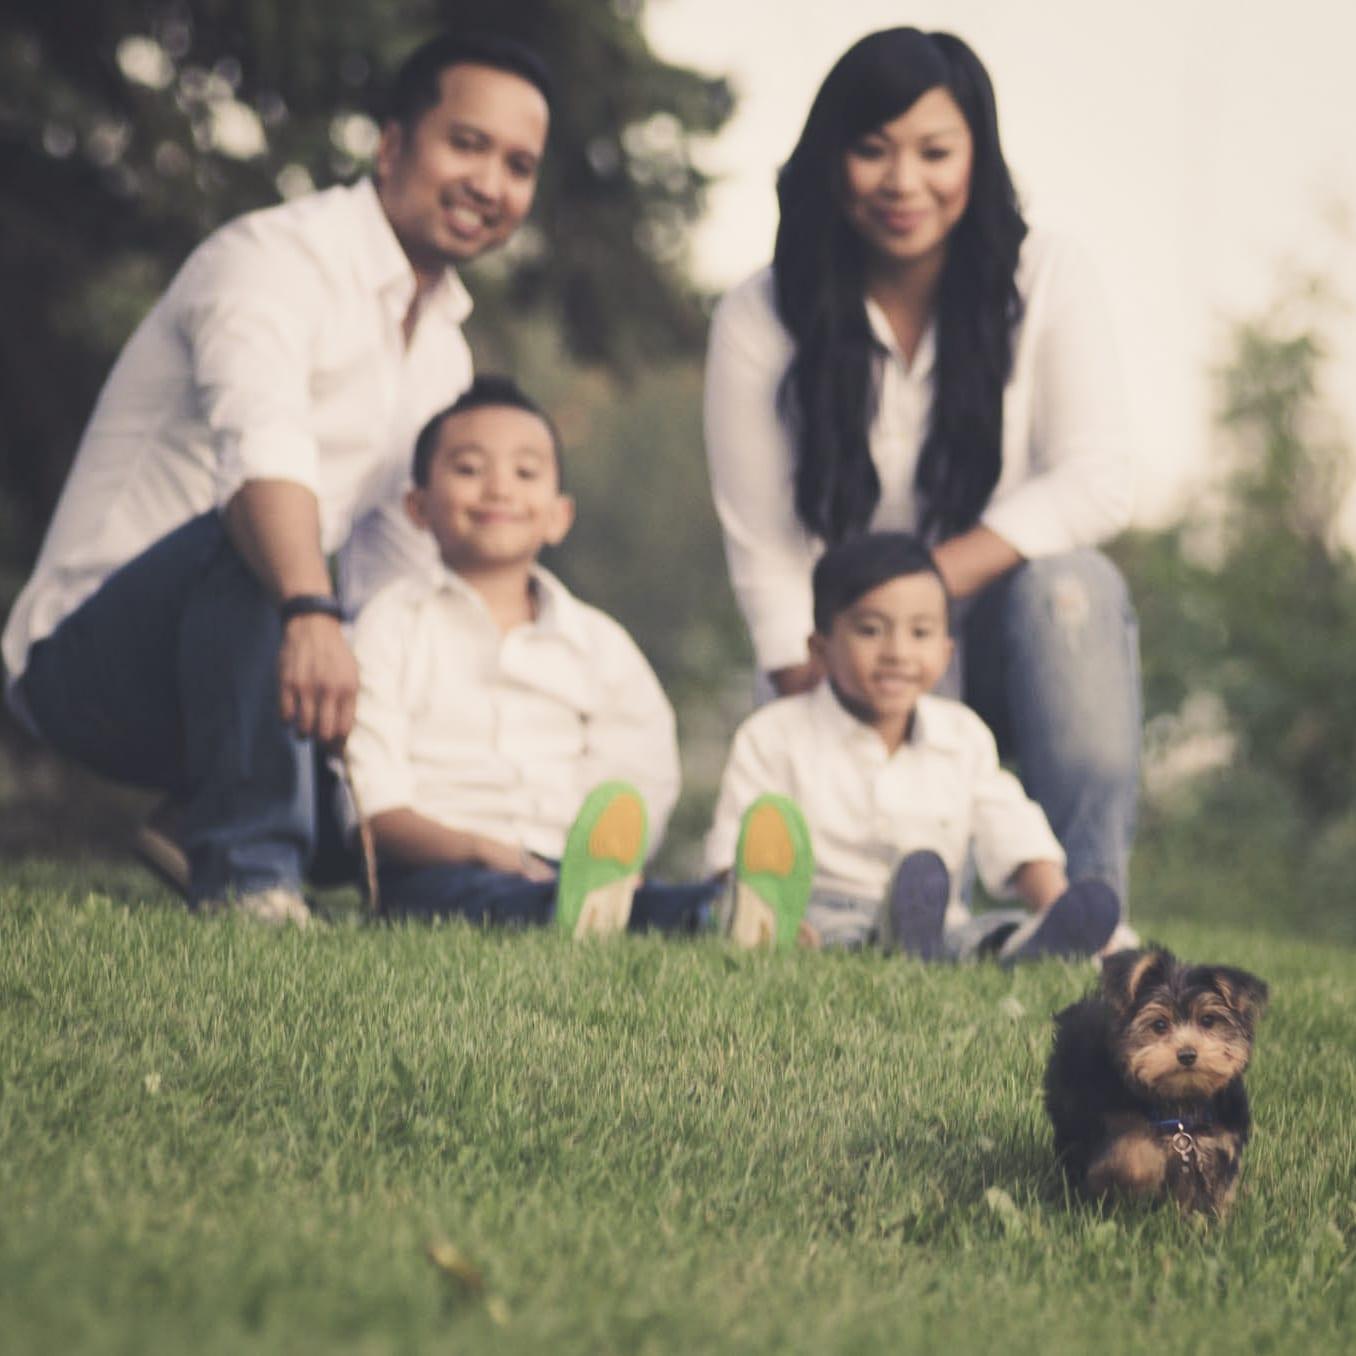 Edmonton Outdoor Family Portrait Photography Session Whitemud Park-001